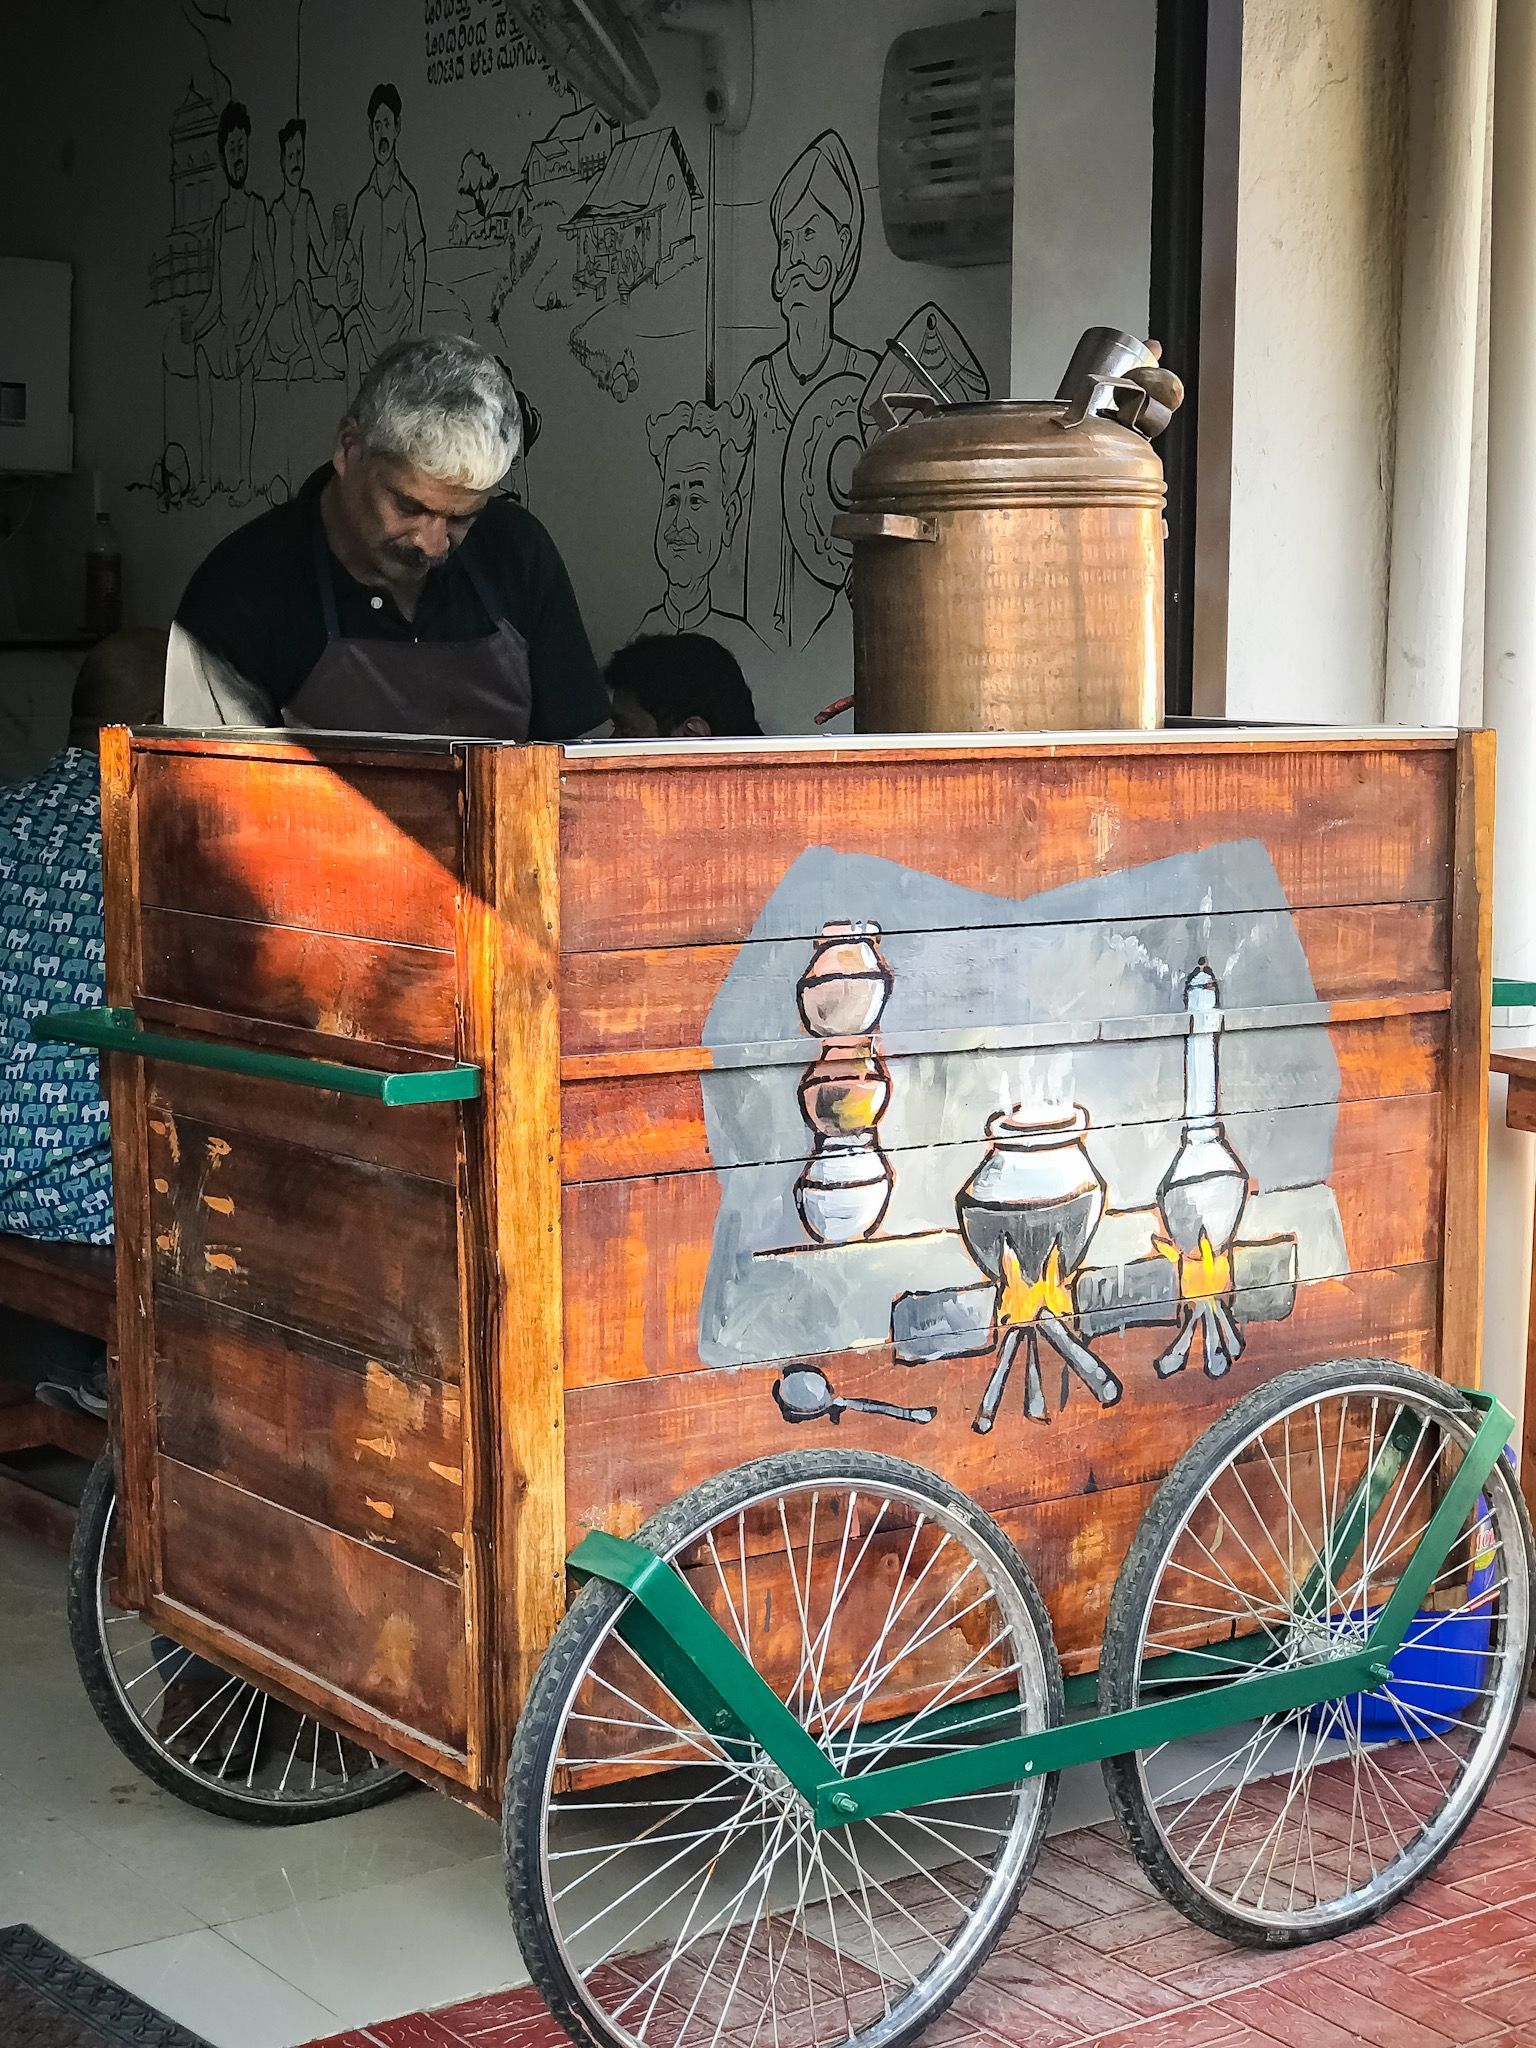 Kerala Tea S Brewed Unlike Rest On India Where Tea S Boiled Found This Lovely Small Cute Kerala Tea Sho Tea Store Design Coffee Shop Interior Design Tea Shop